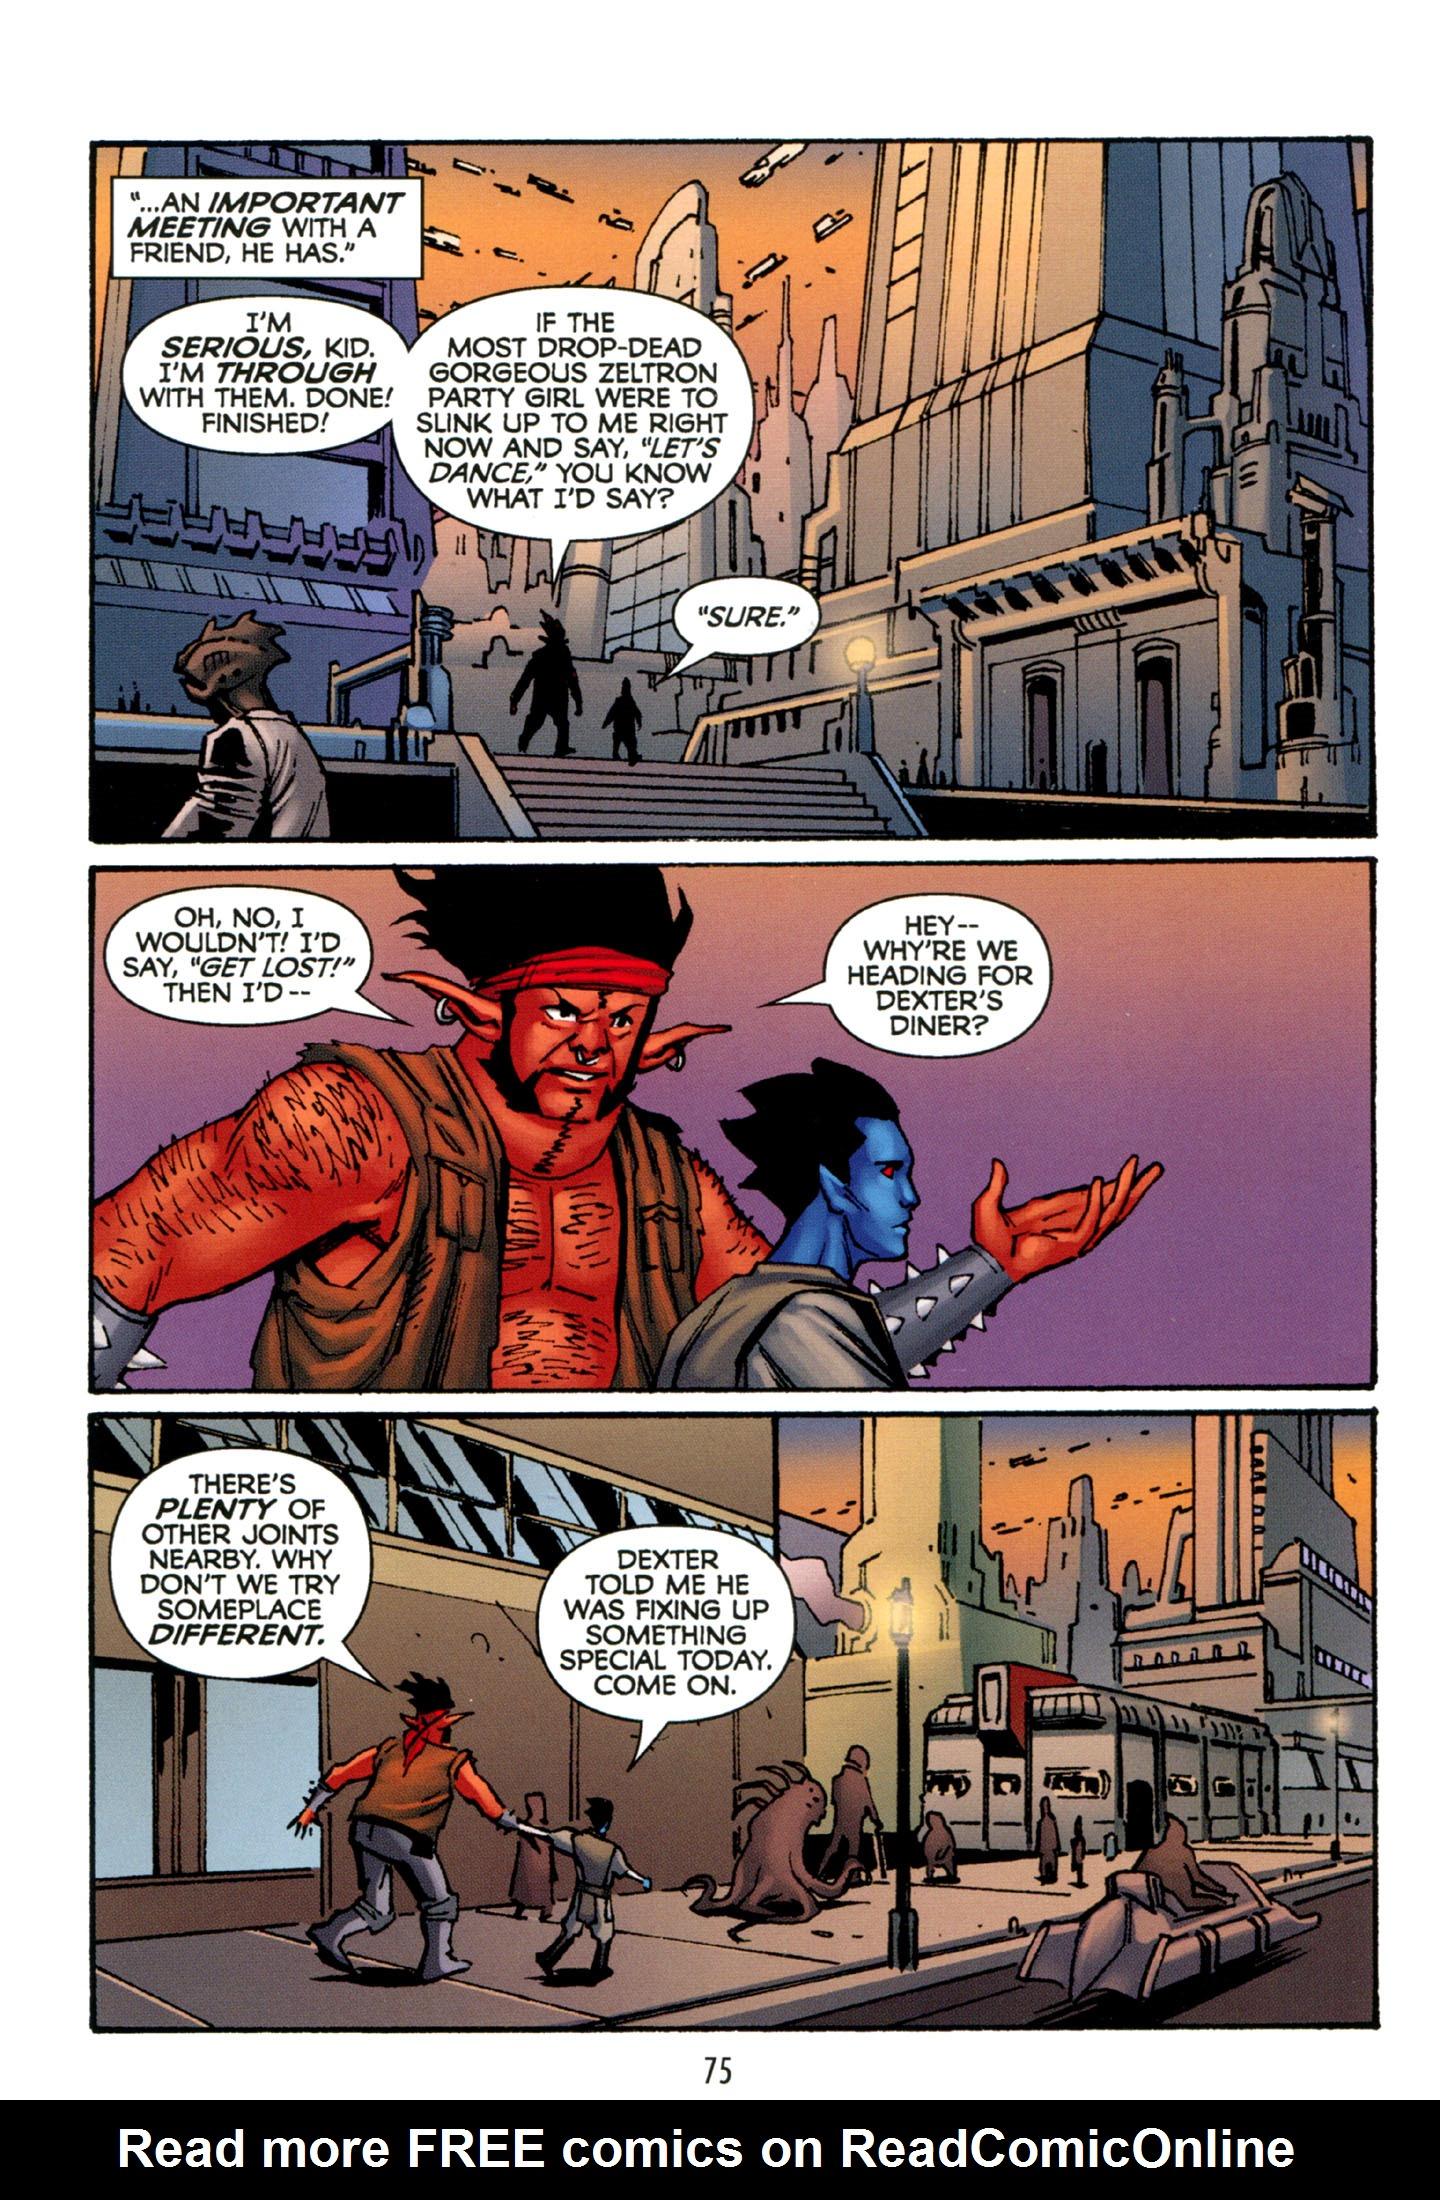 Read online Star Wars: The Clone Wars - Strange Allies comic -  Issue # Full - 76